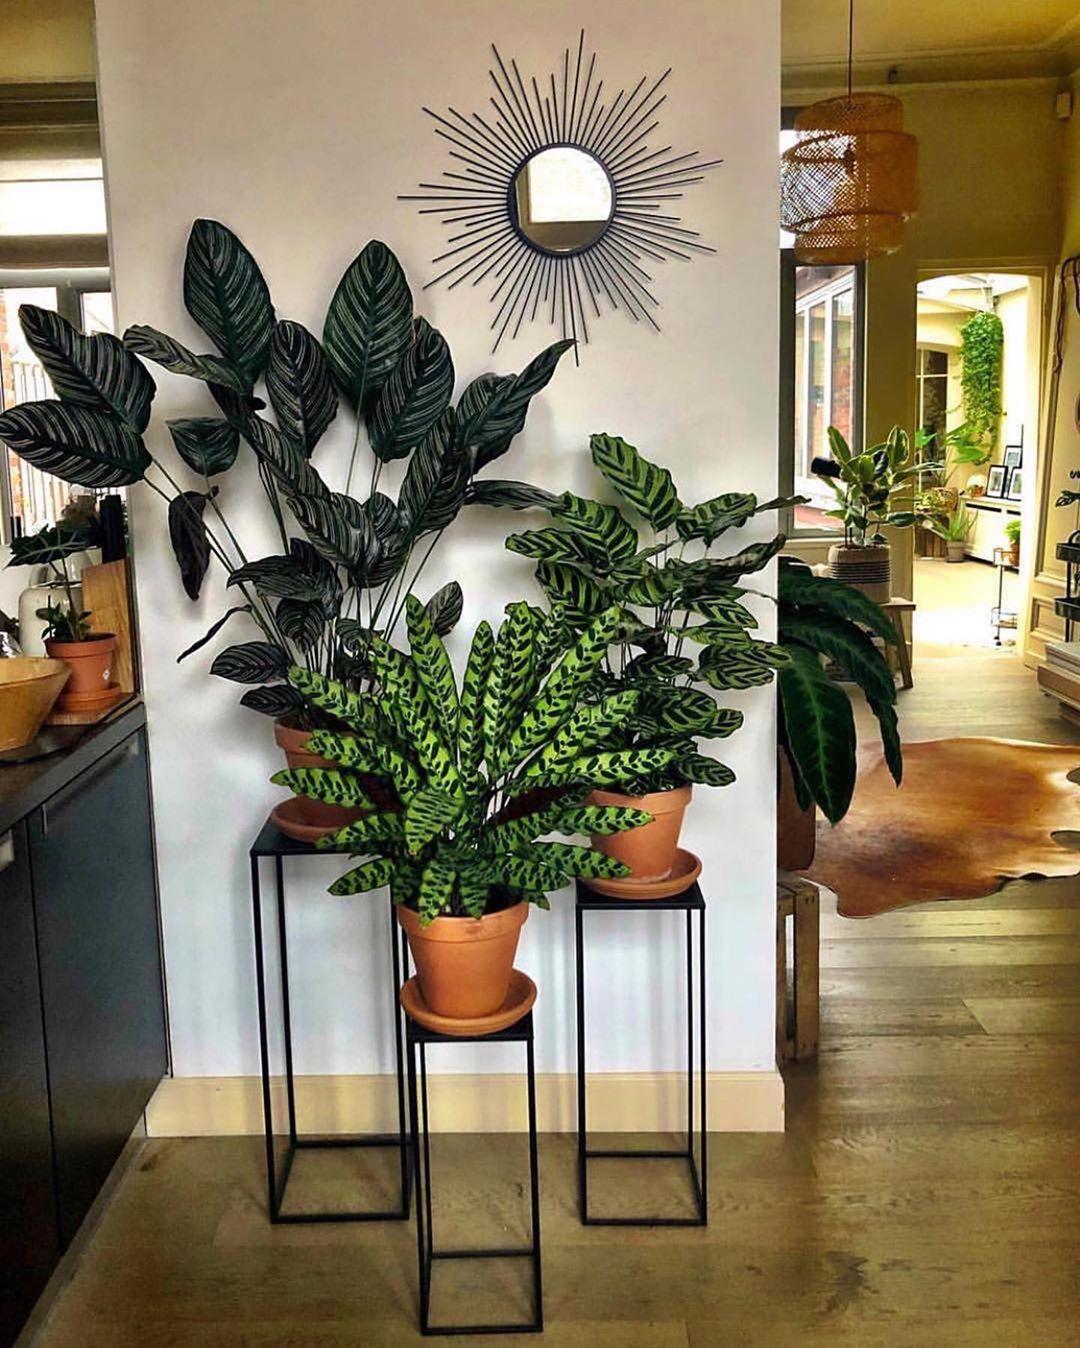 60 Indoor Decorative Plants To Bring Freshness